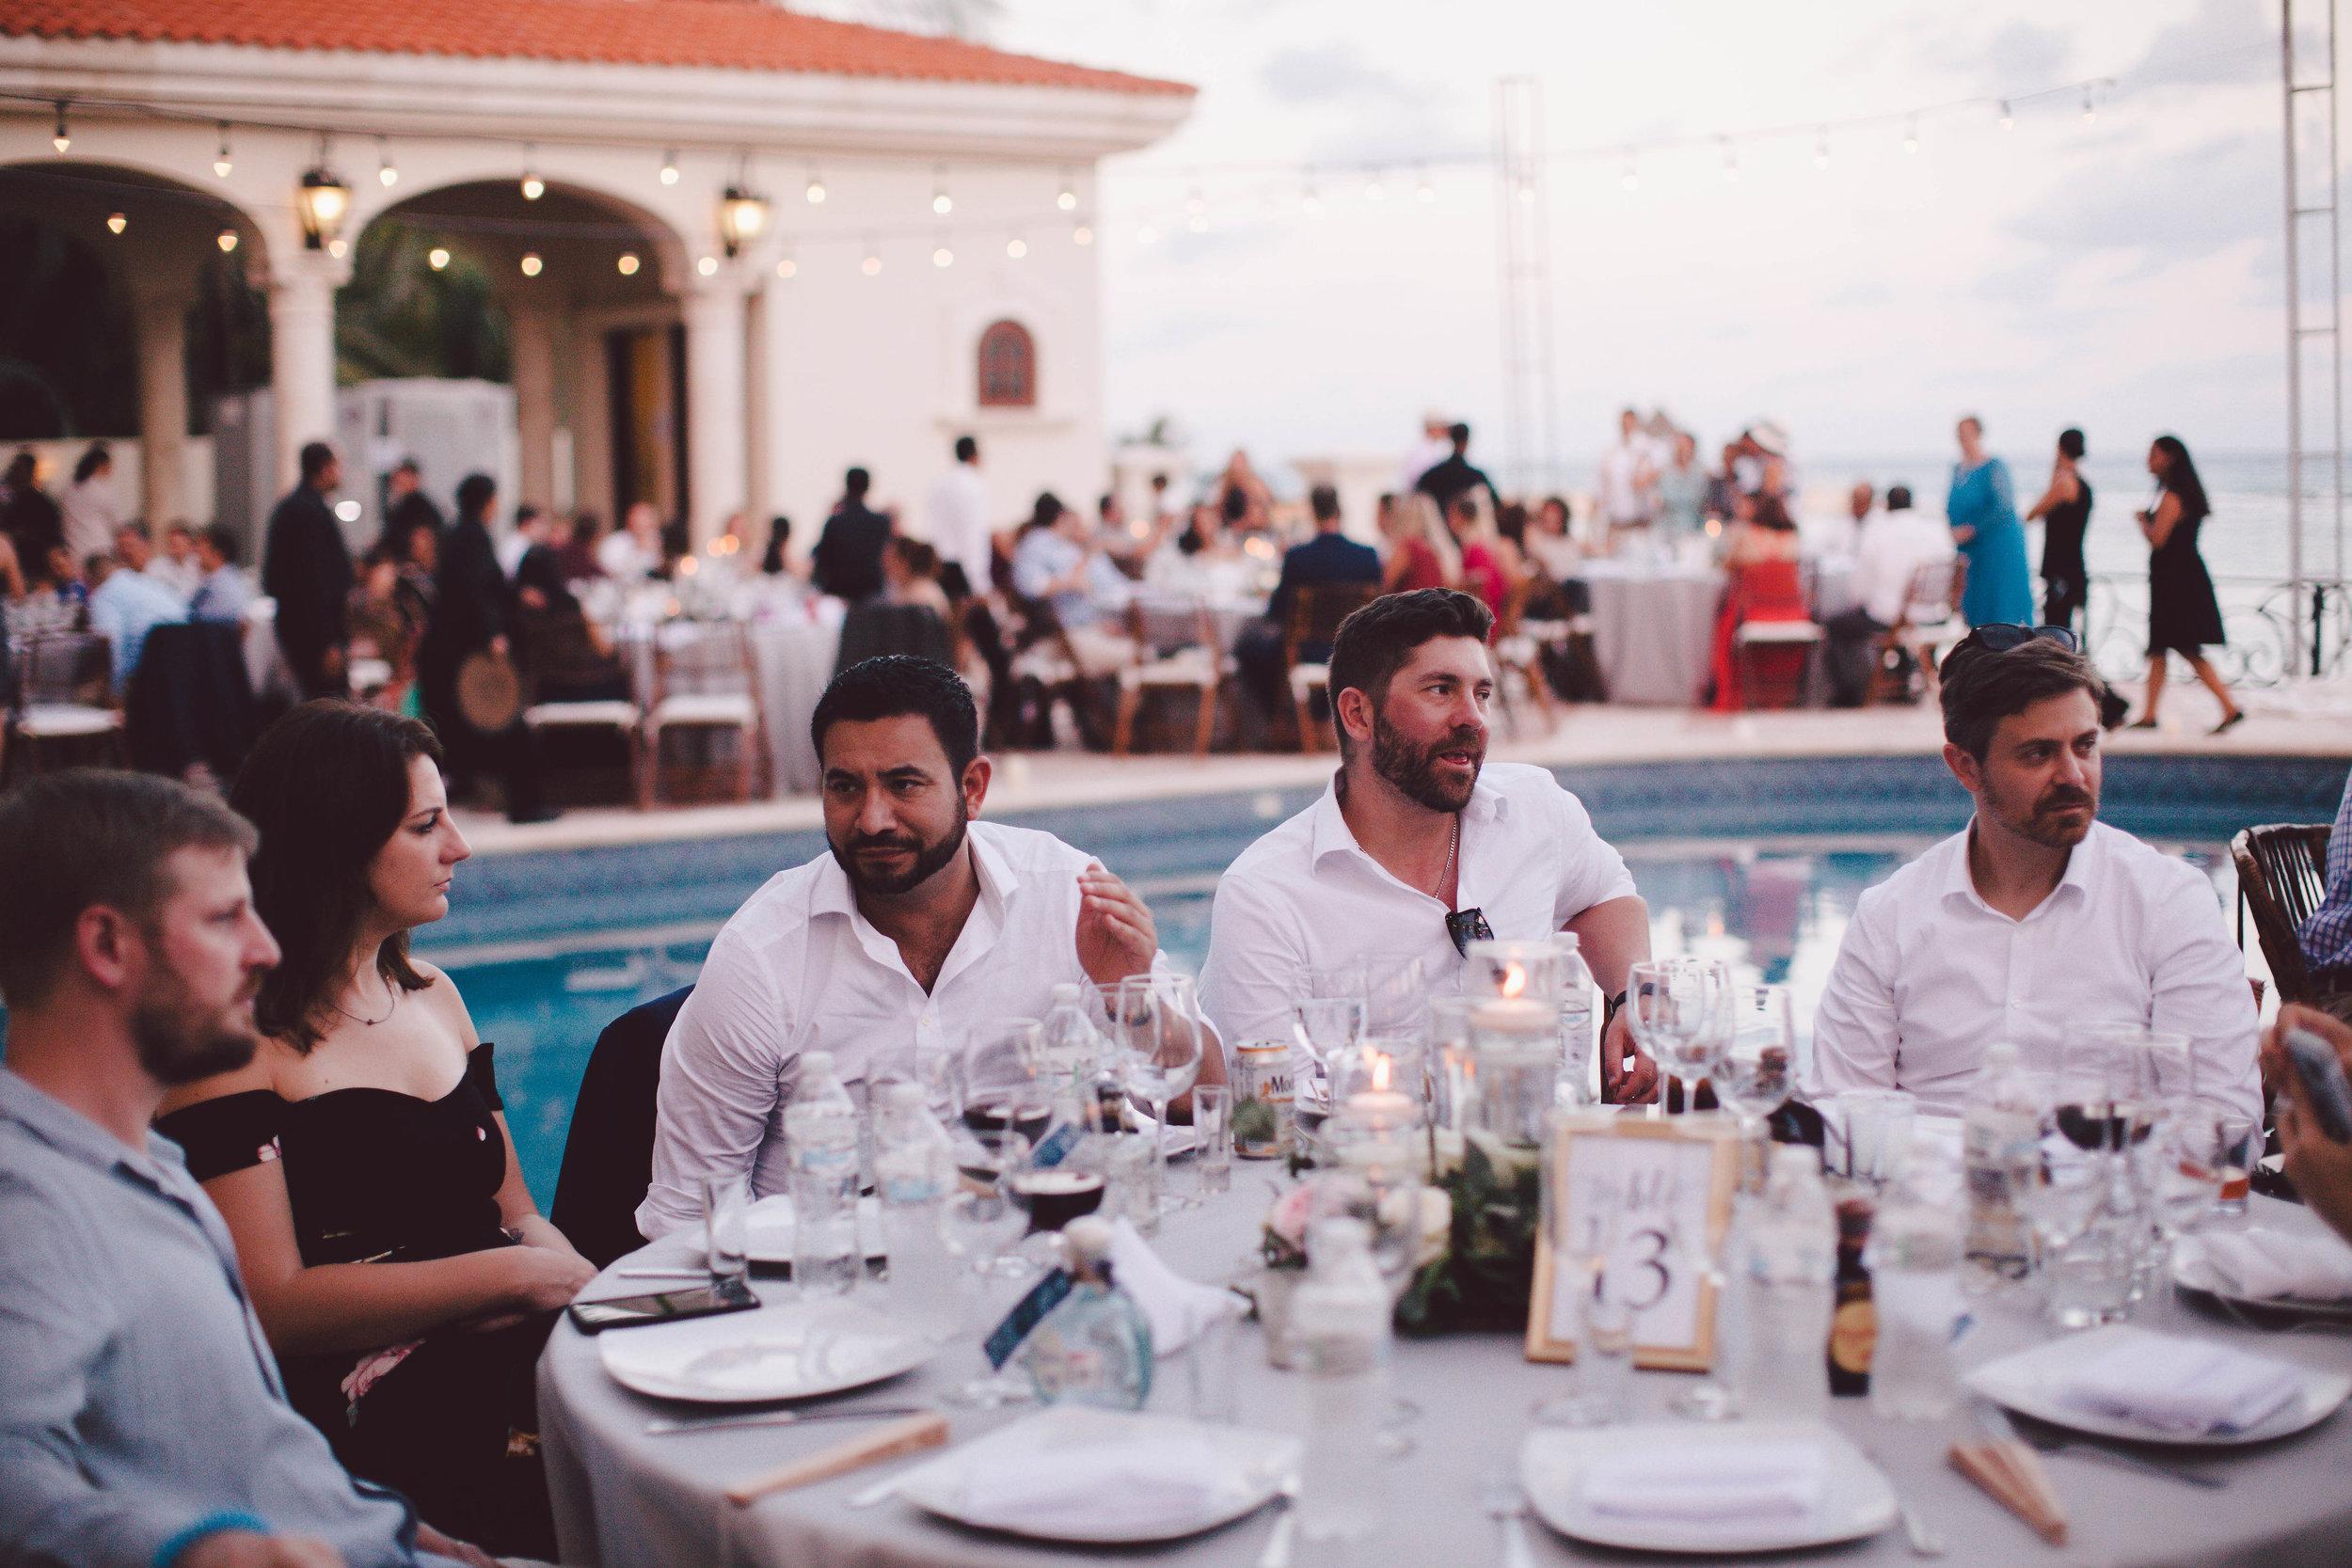 mexico_wedding_cancun_villa_la_joya_evangeline_lane_120a.jpg